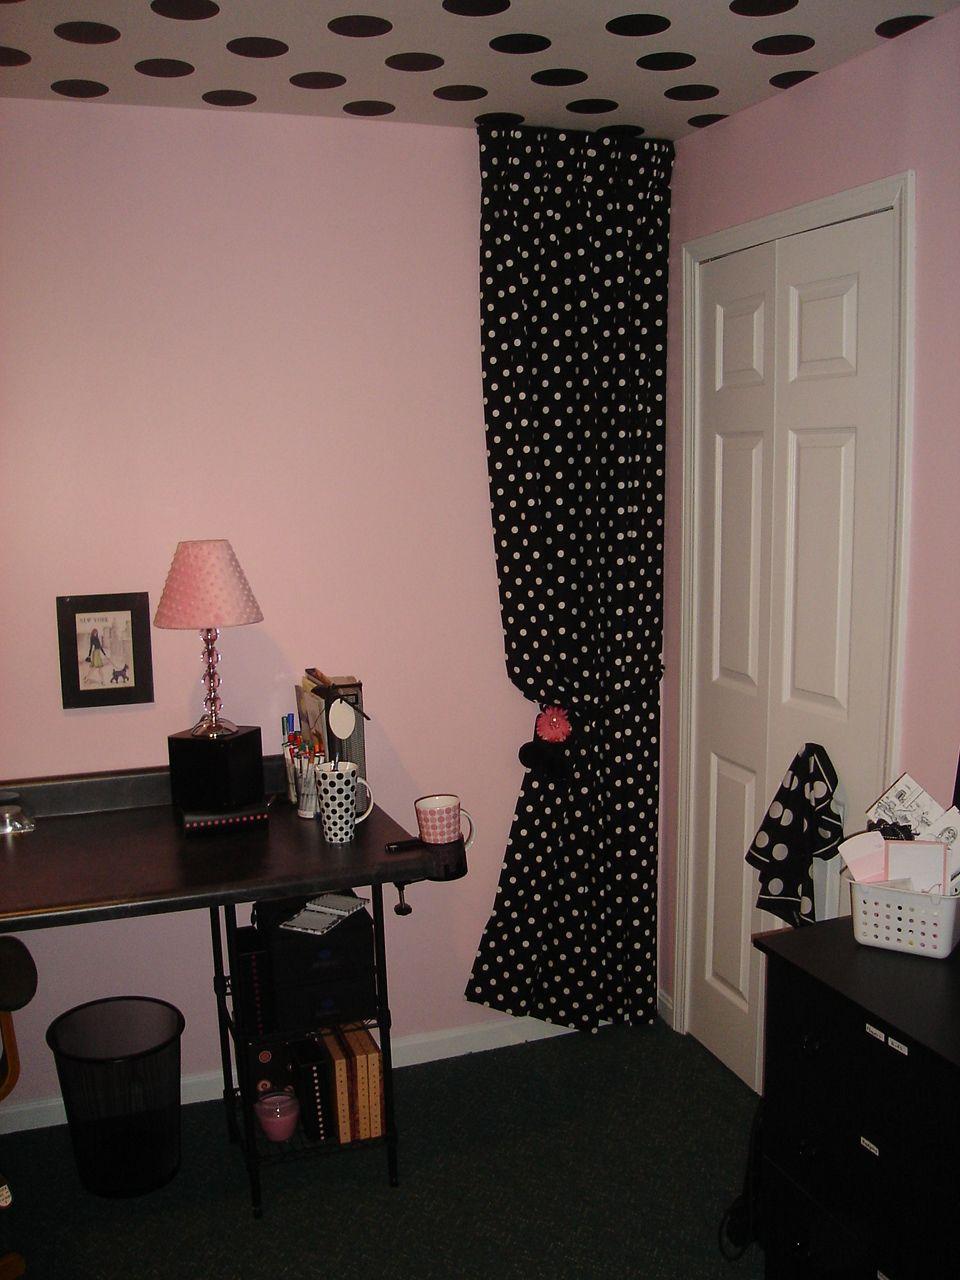 Design Your Own Room: Design Your Own Scrapbook Room